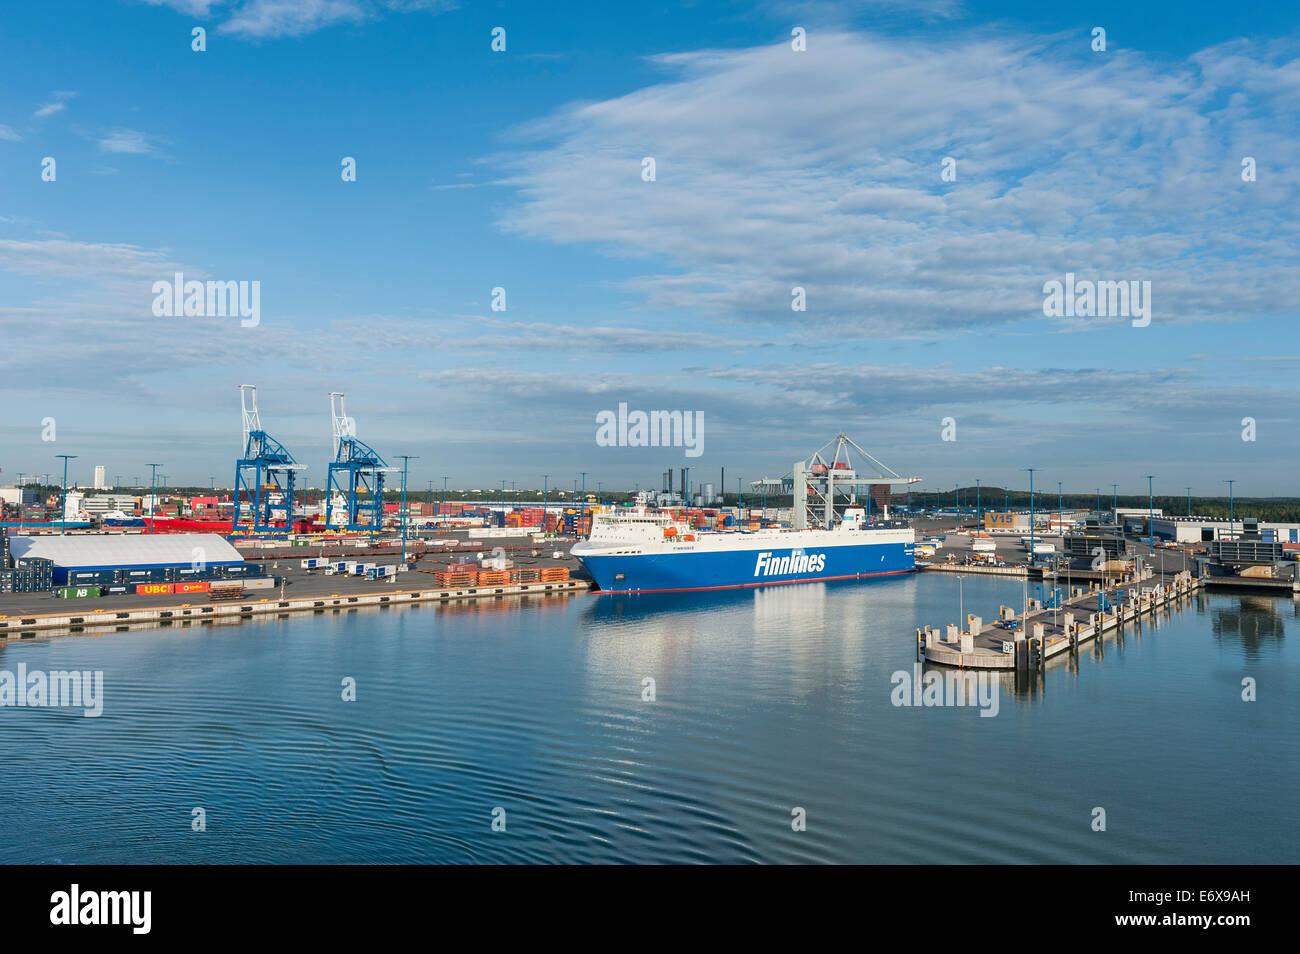 Cargo port of Helsinki, 'Finnwave' container ship of Finnlines Group, built in 2012, Helsinki, Finland - Stock Image